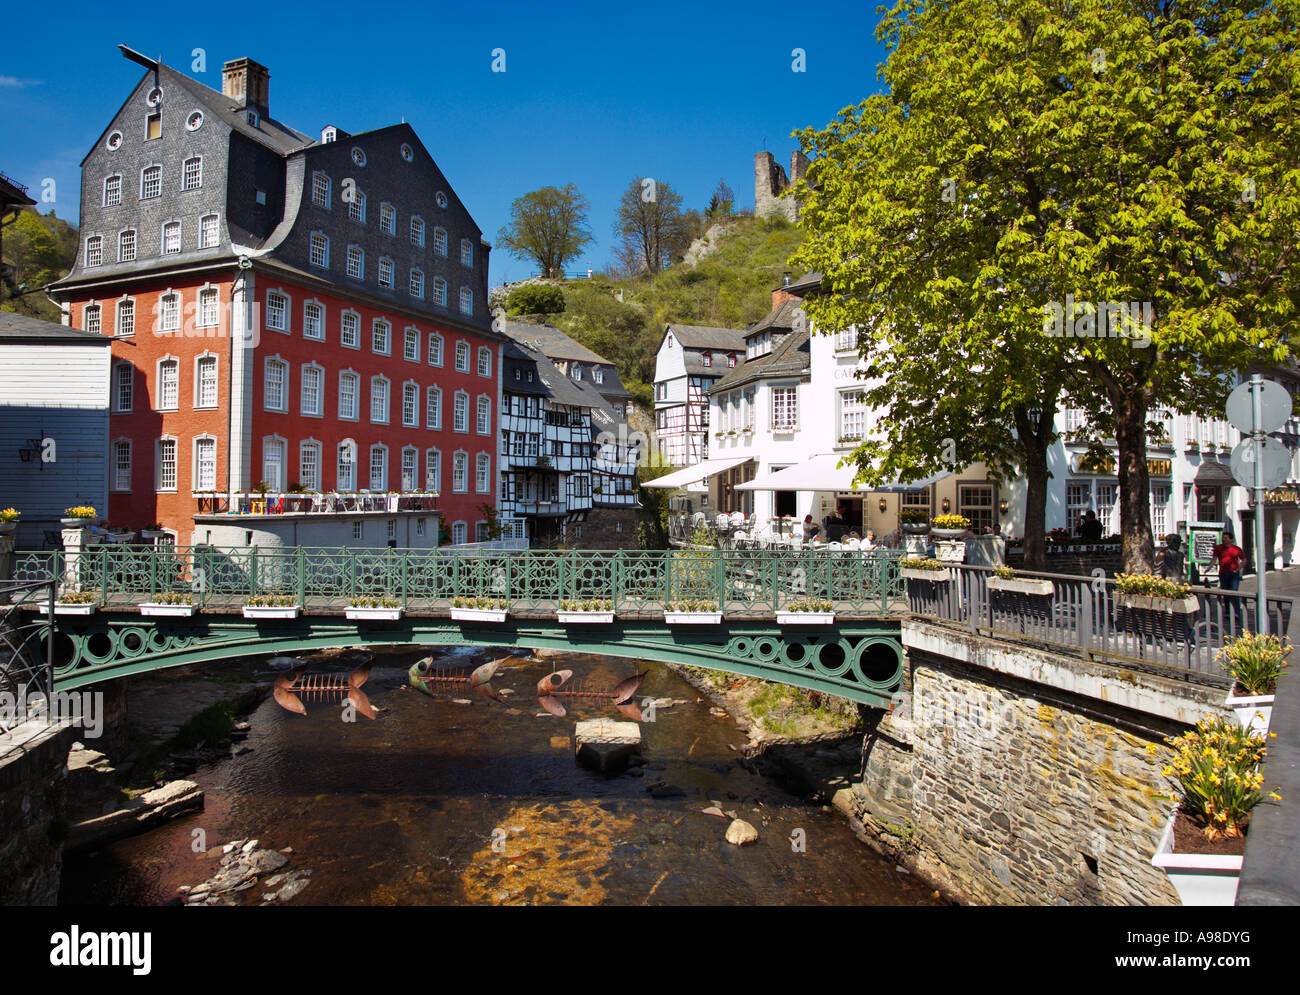 Rotes Haus on the River Rur at Monschau Eifel Region